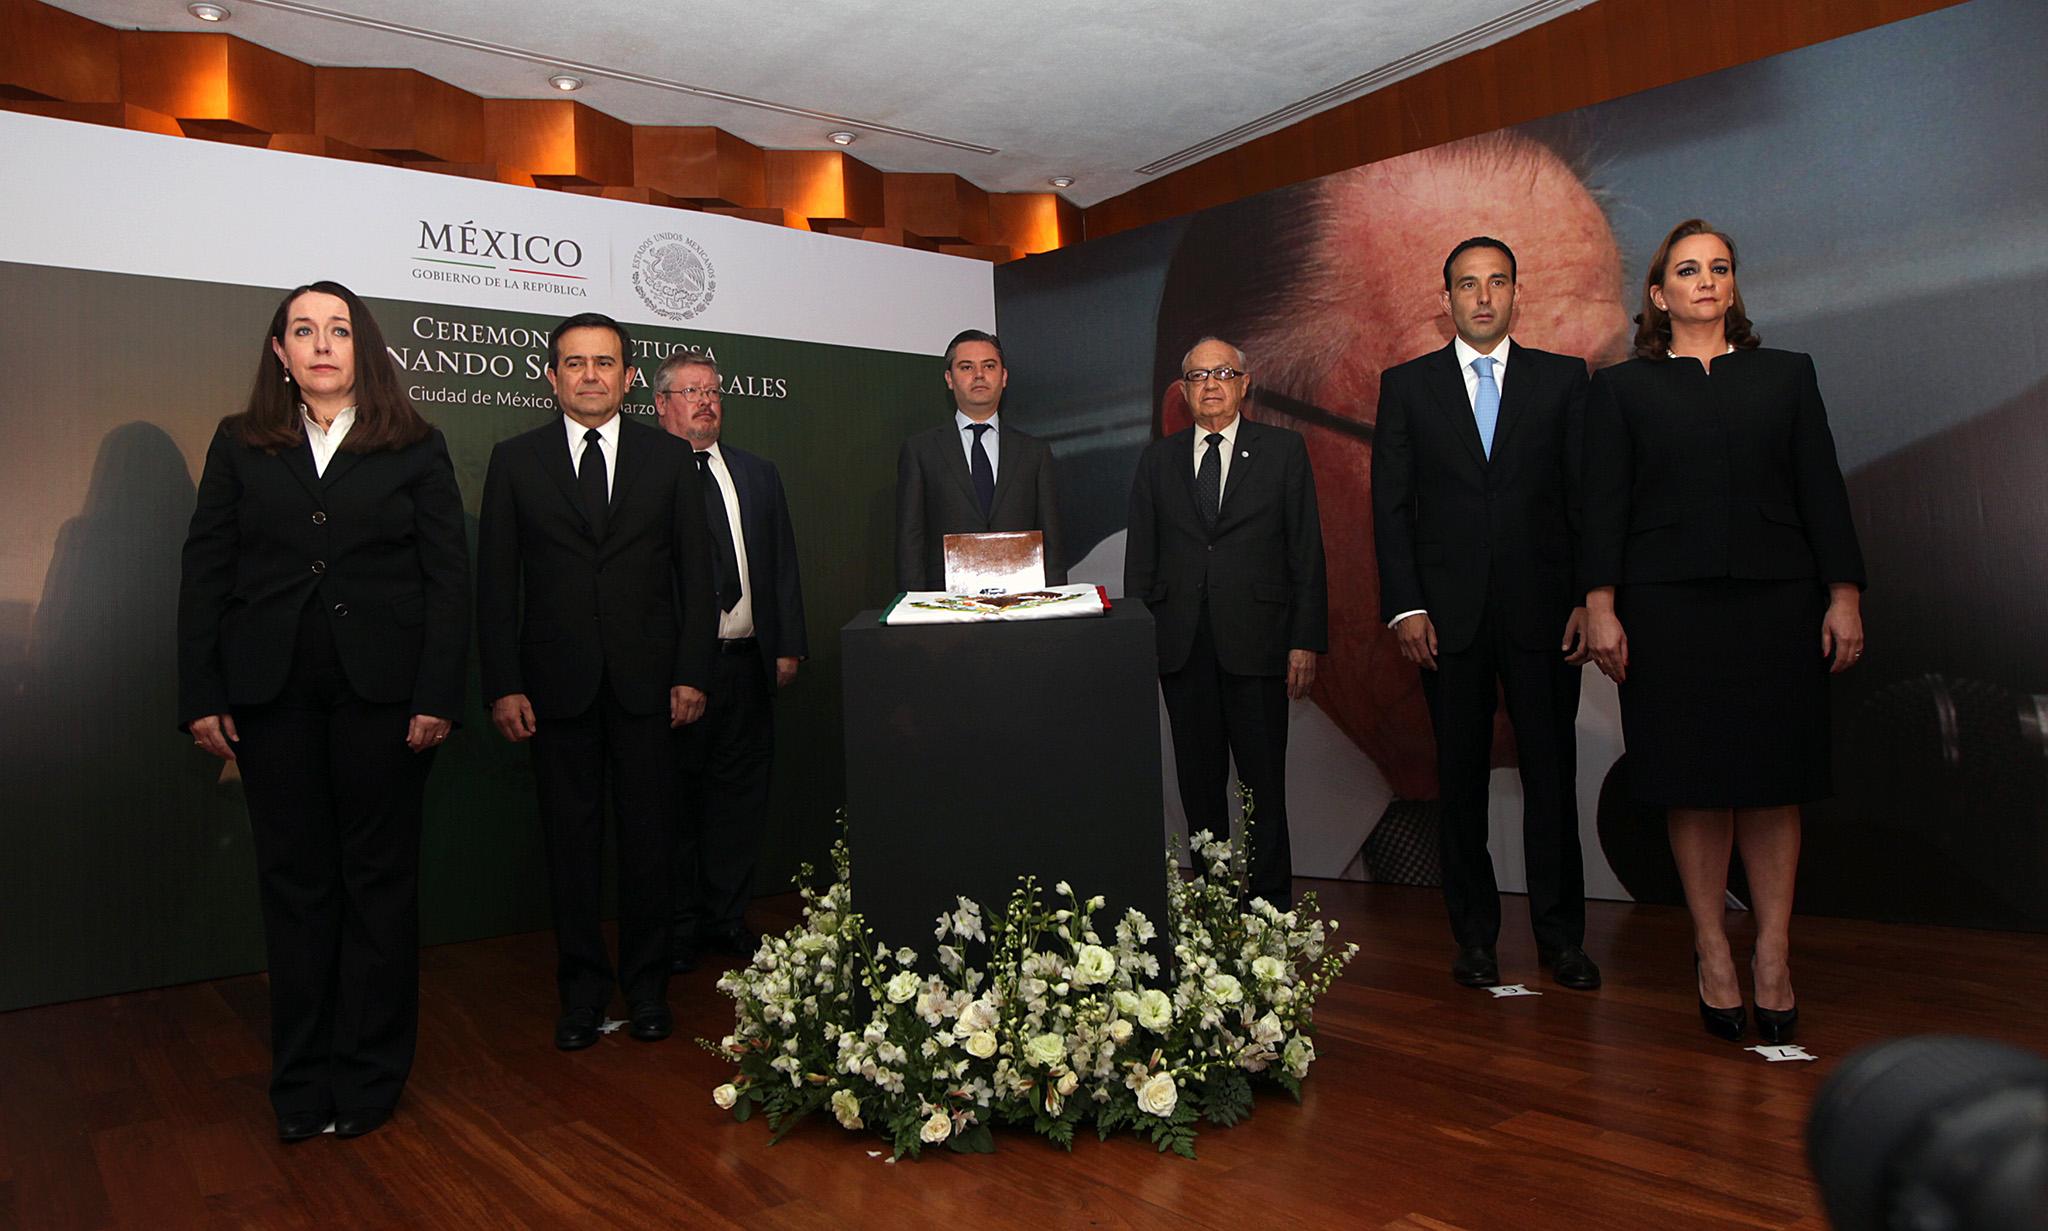 Ceremonia luctuosa del ex Canciller Fernando Solana 04jpg